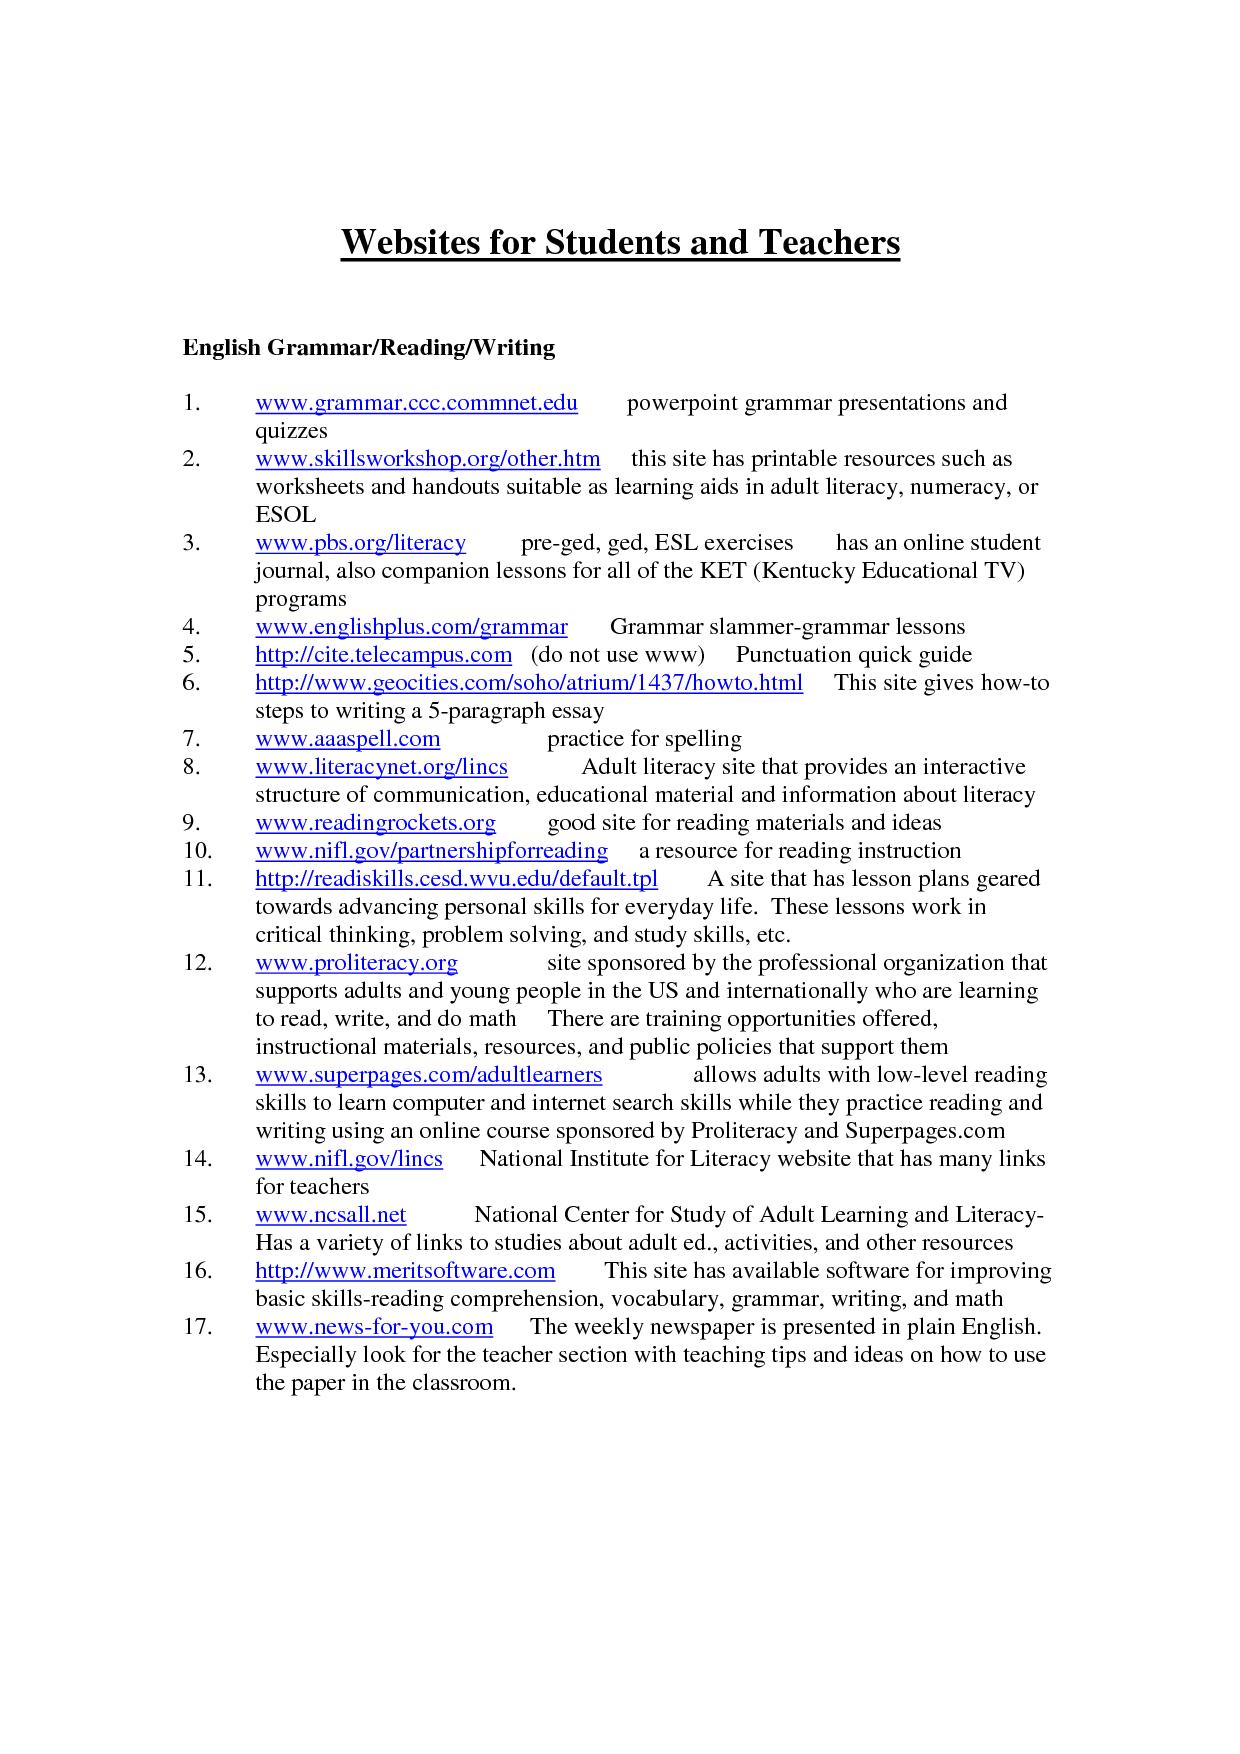 Free Ged Worksheets - Oaklandeffect - Free Printable Ged Worksheets